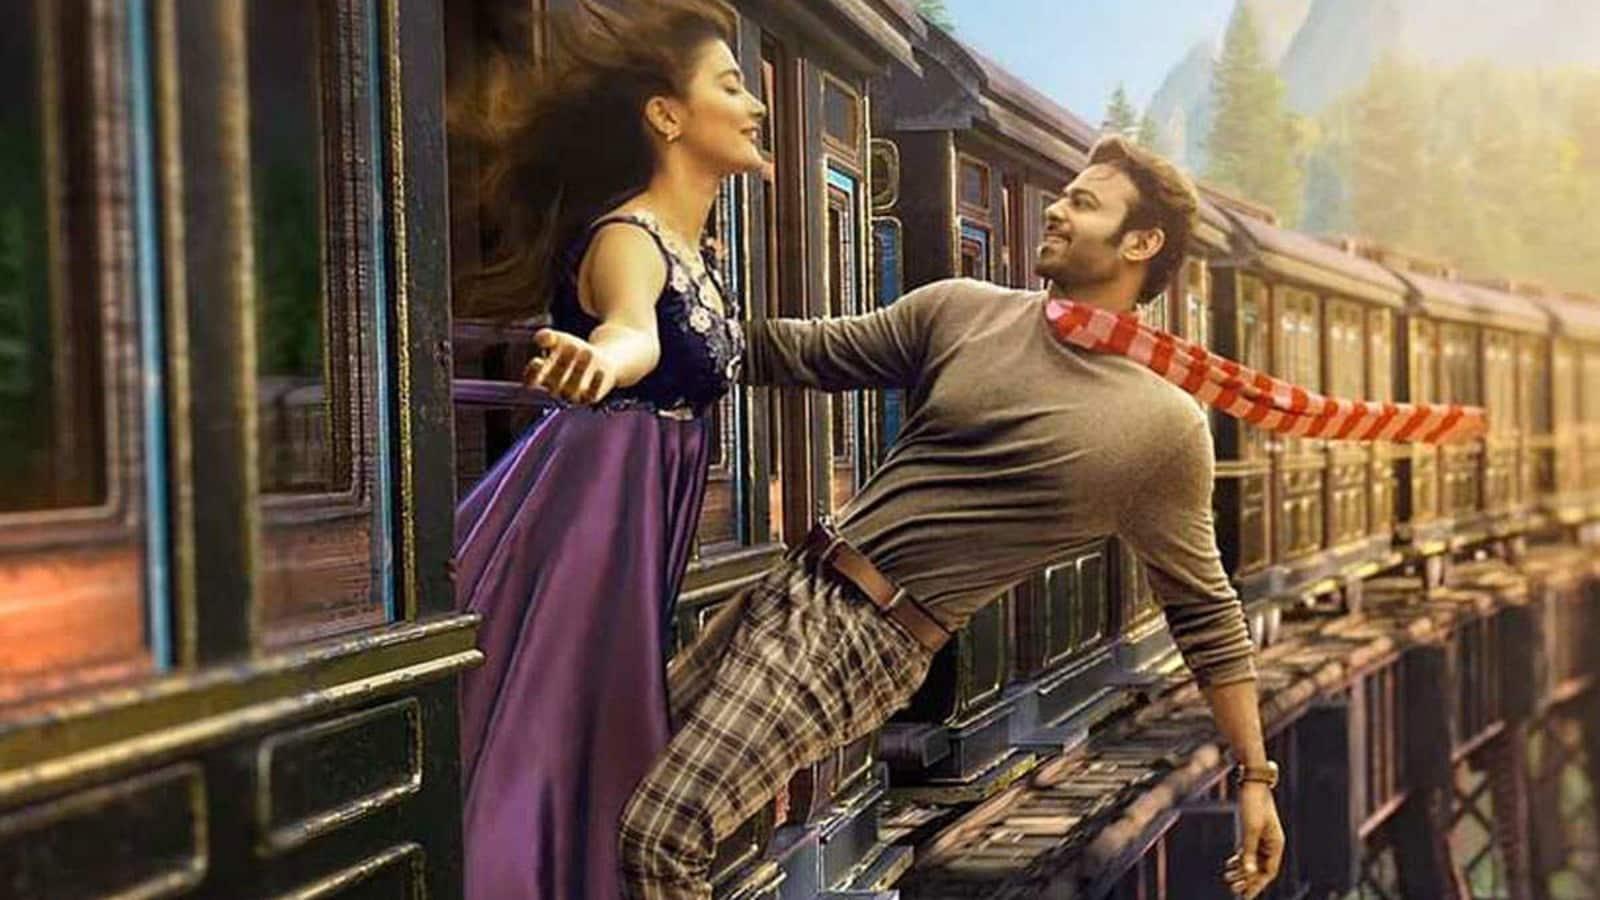 Prabhas annoyed by Pooja Hegde's 'unprofessional behaviour'? Radhe Shyam producers clarify - Hindustan Times